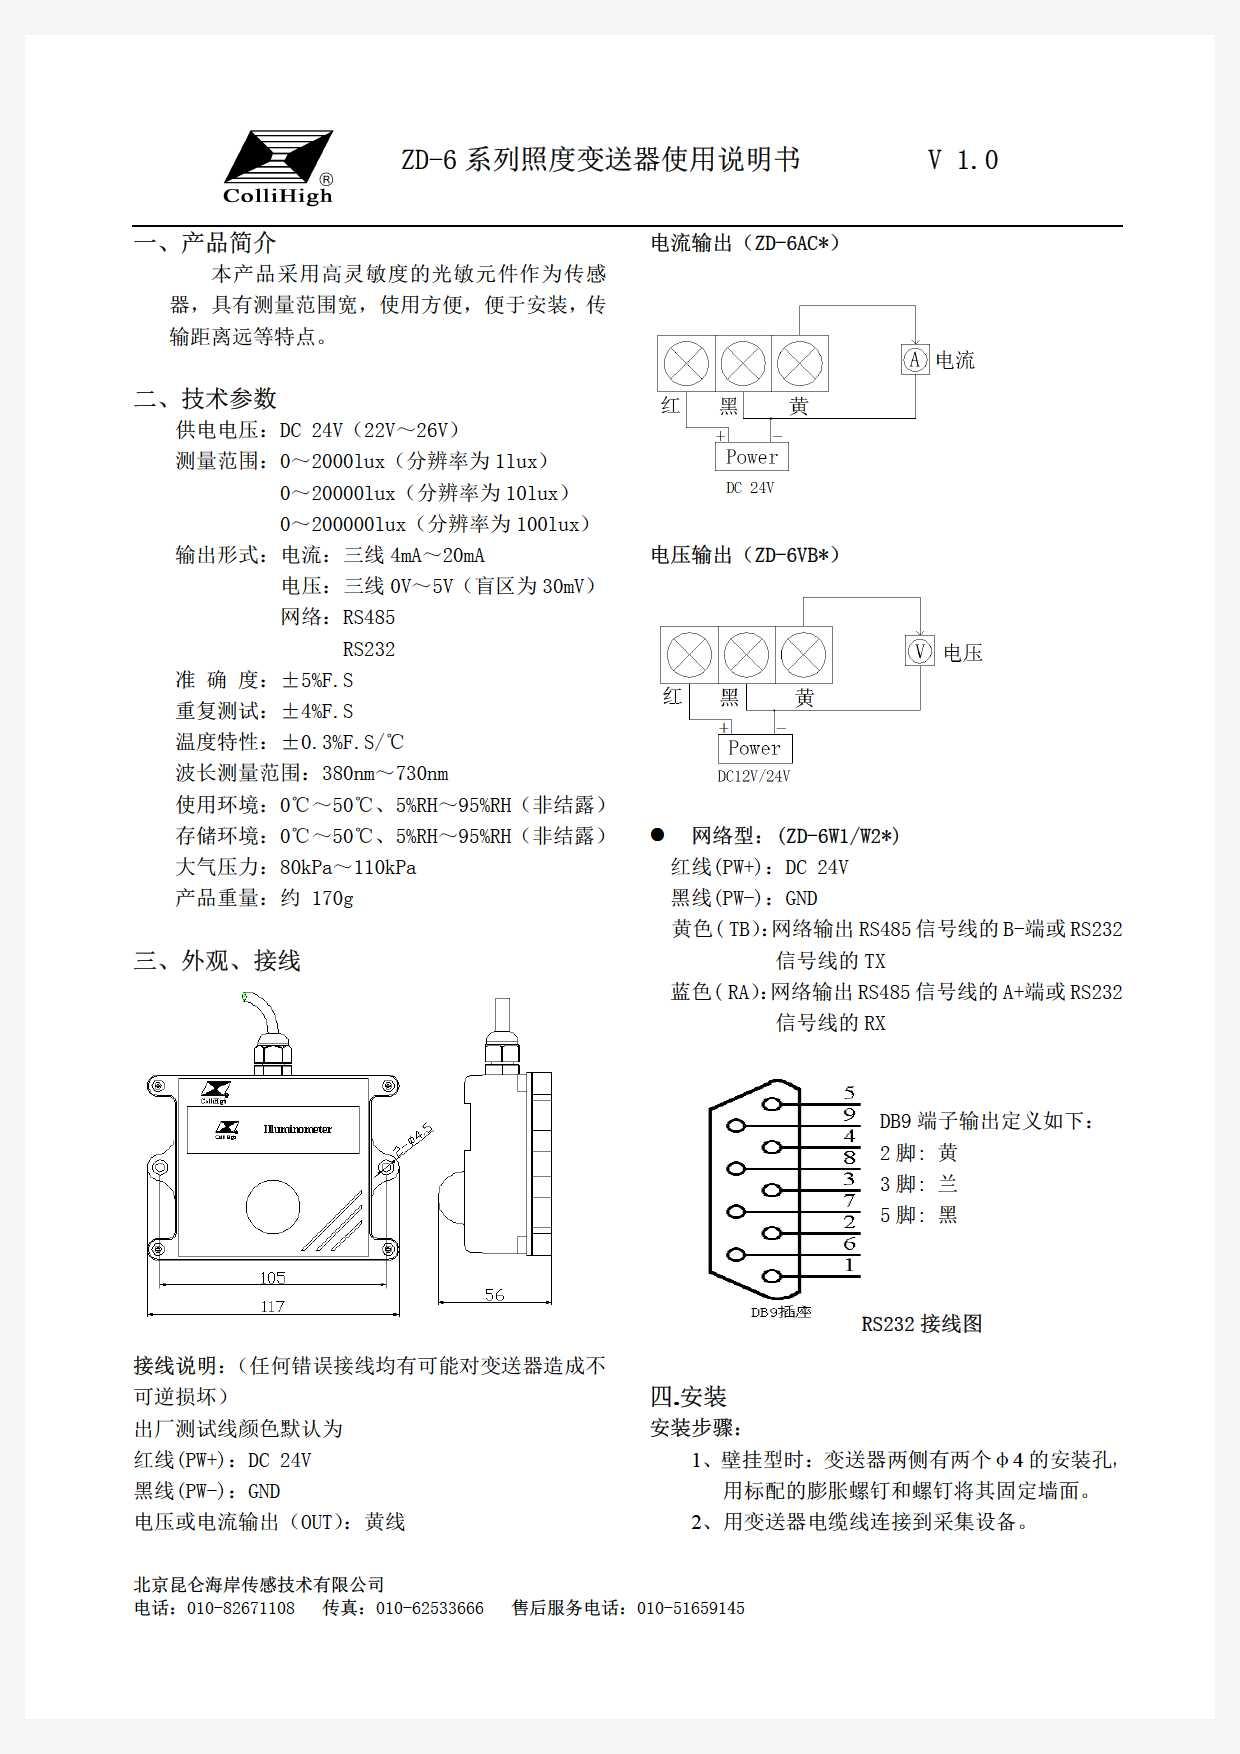 zd-6系列照度变送器使用说明书